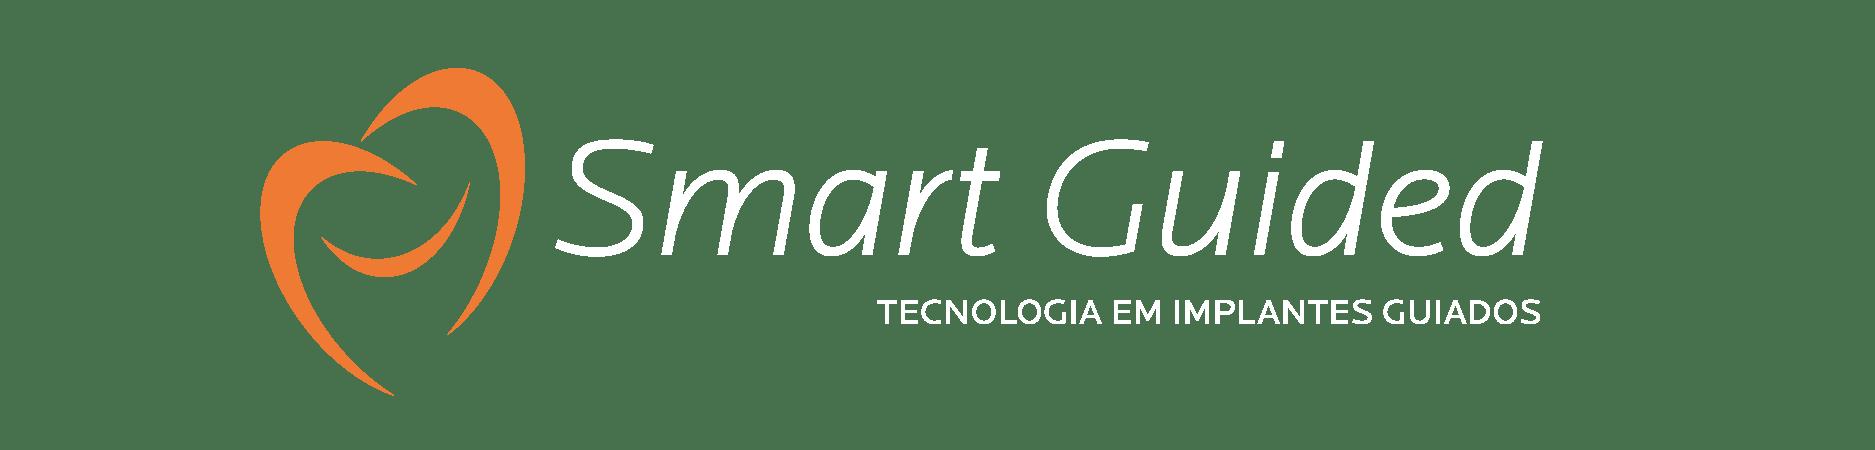 Logo_Smart_Guided (4)_Prancheta 1 cópia 3